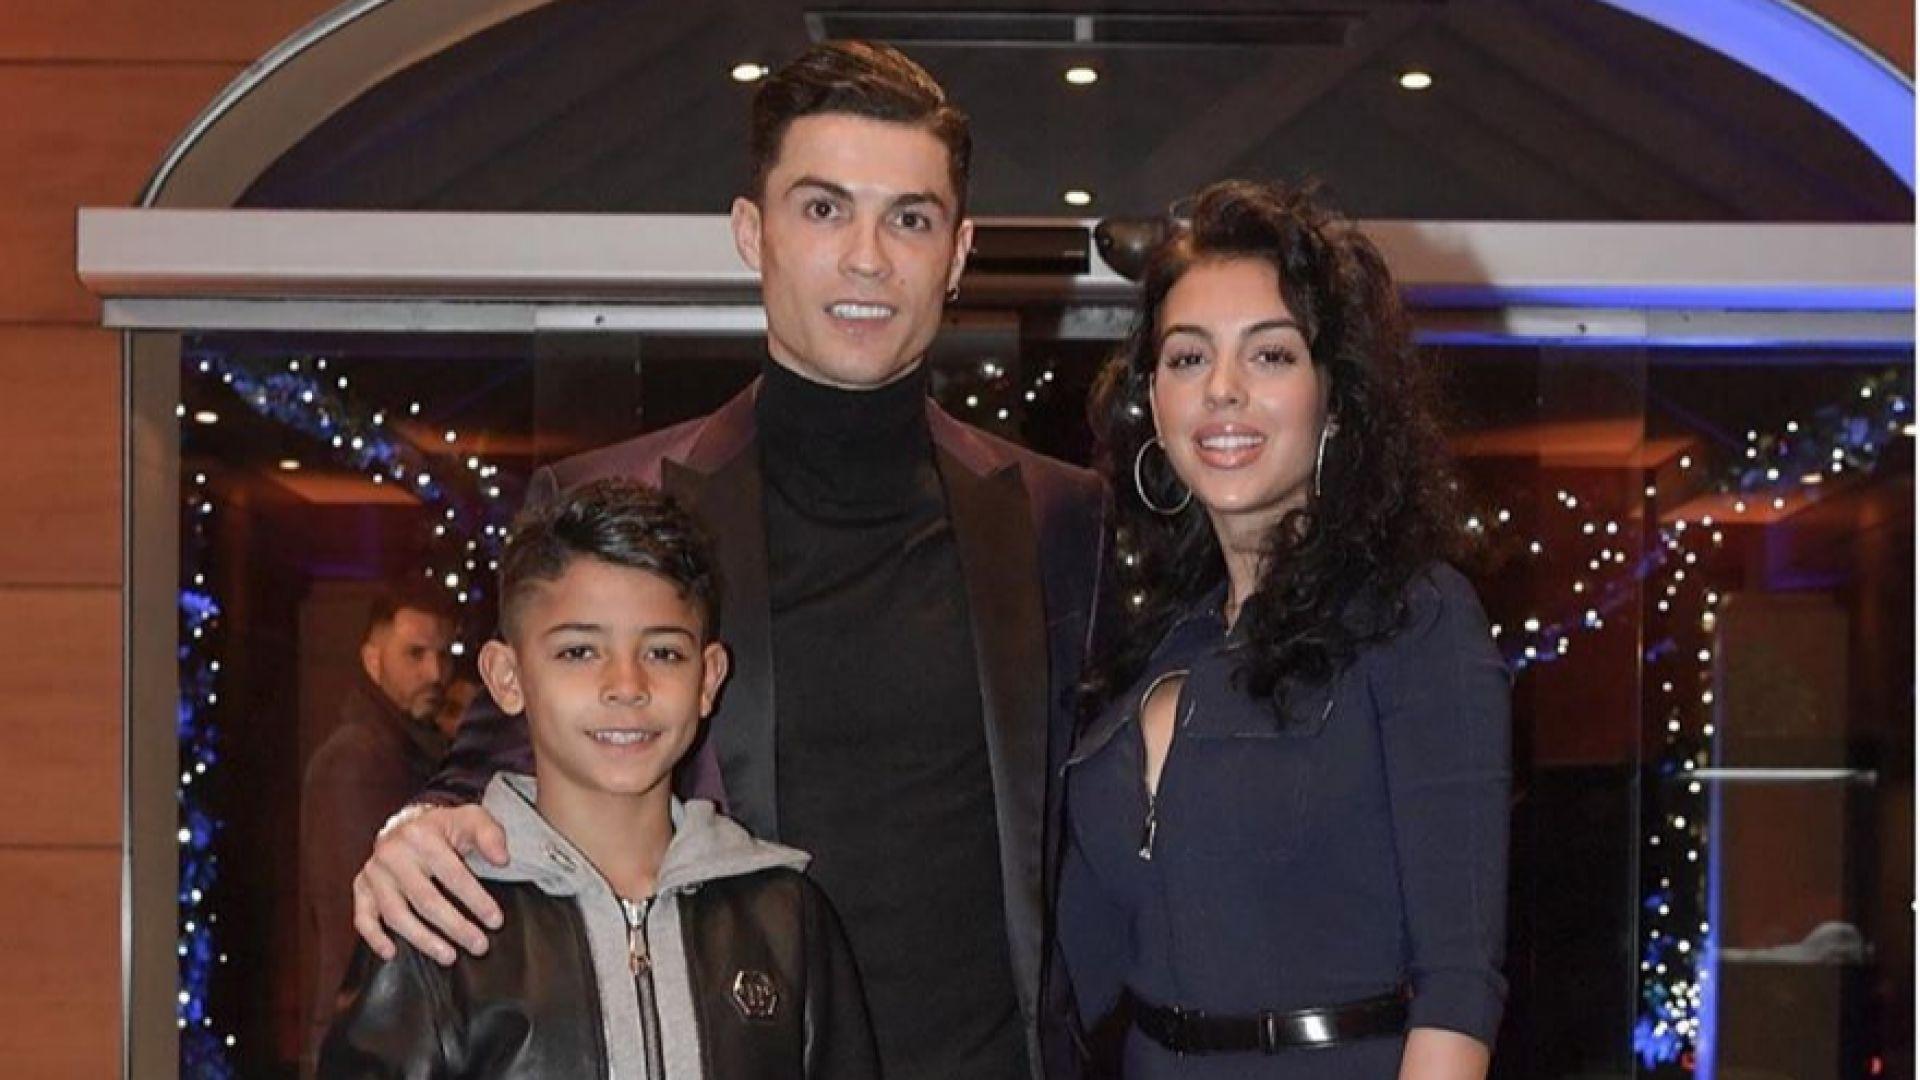 Кристиано Роналдо и Джорджина Родригес - щастливи и стилни на семейна вечеря